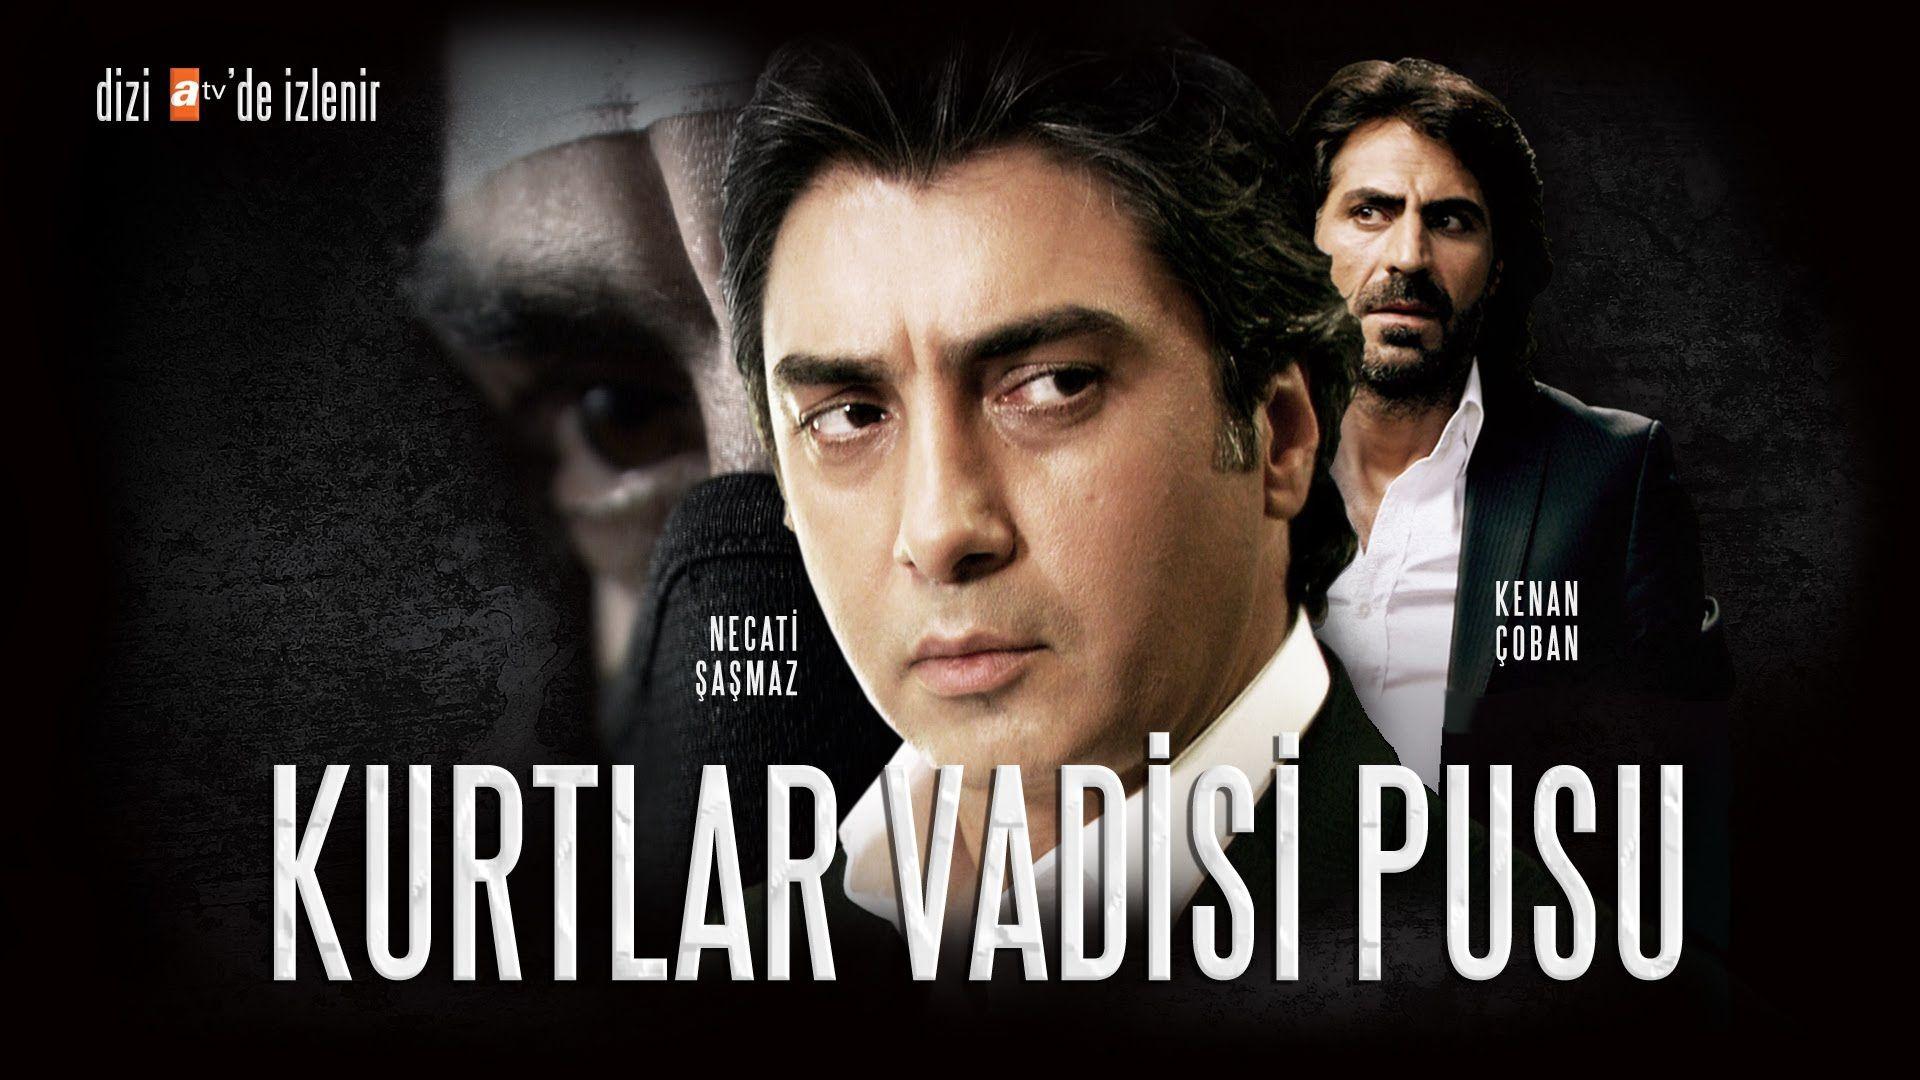 Kurtlar Vadisi Pusu 228 Bolum Tek Parca Full Hd 1080 P Youtube Youtube Music Movie Posters